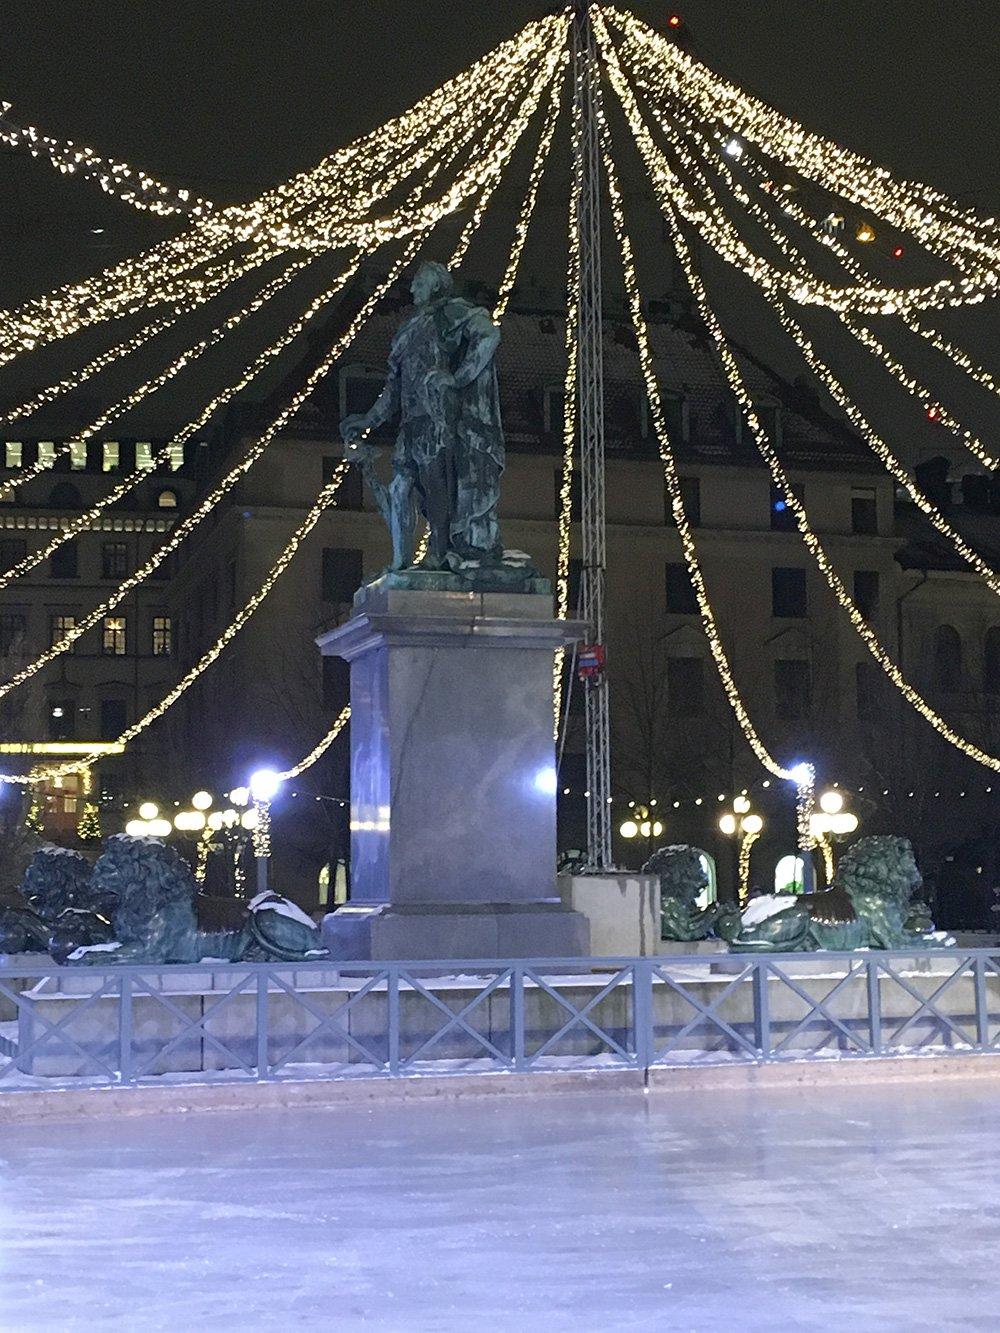 Karl XIII:s staty, Erik Gustaf Göthe,Kungsträdgården